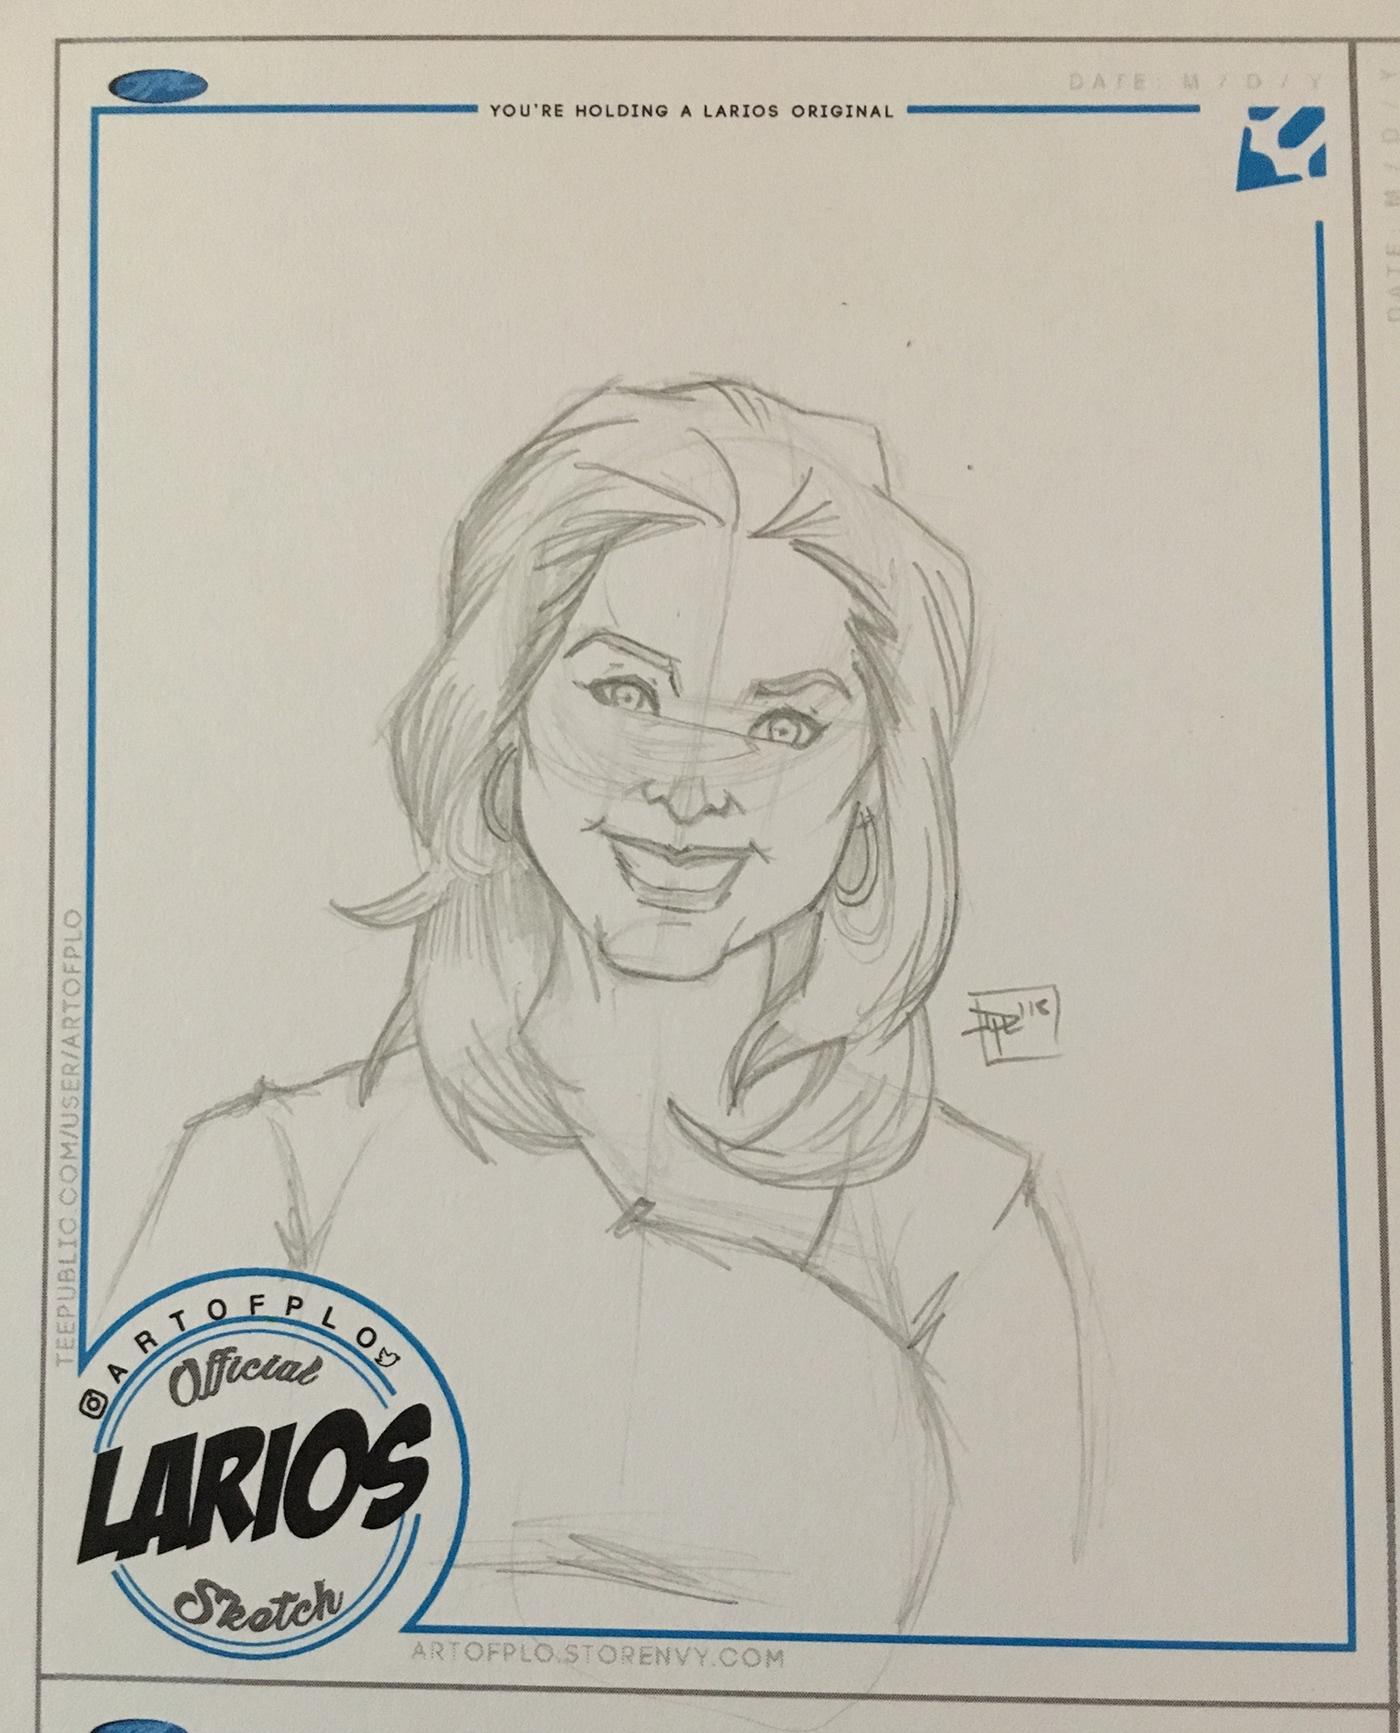 larios,art,sketch,sketches,drawings,portraits